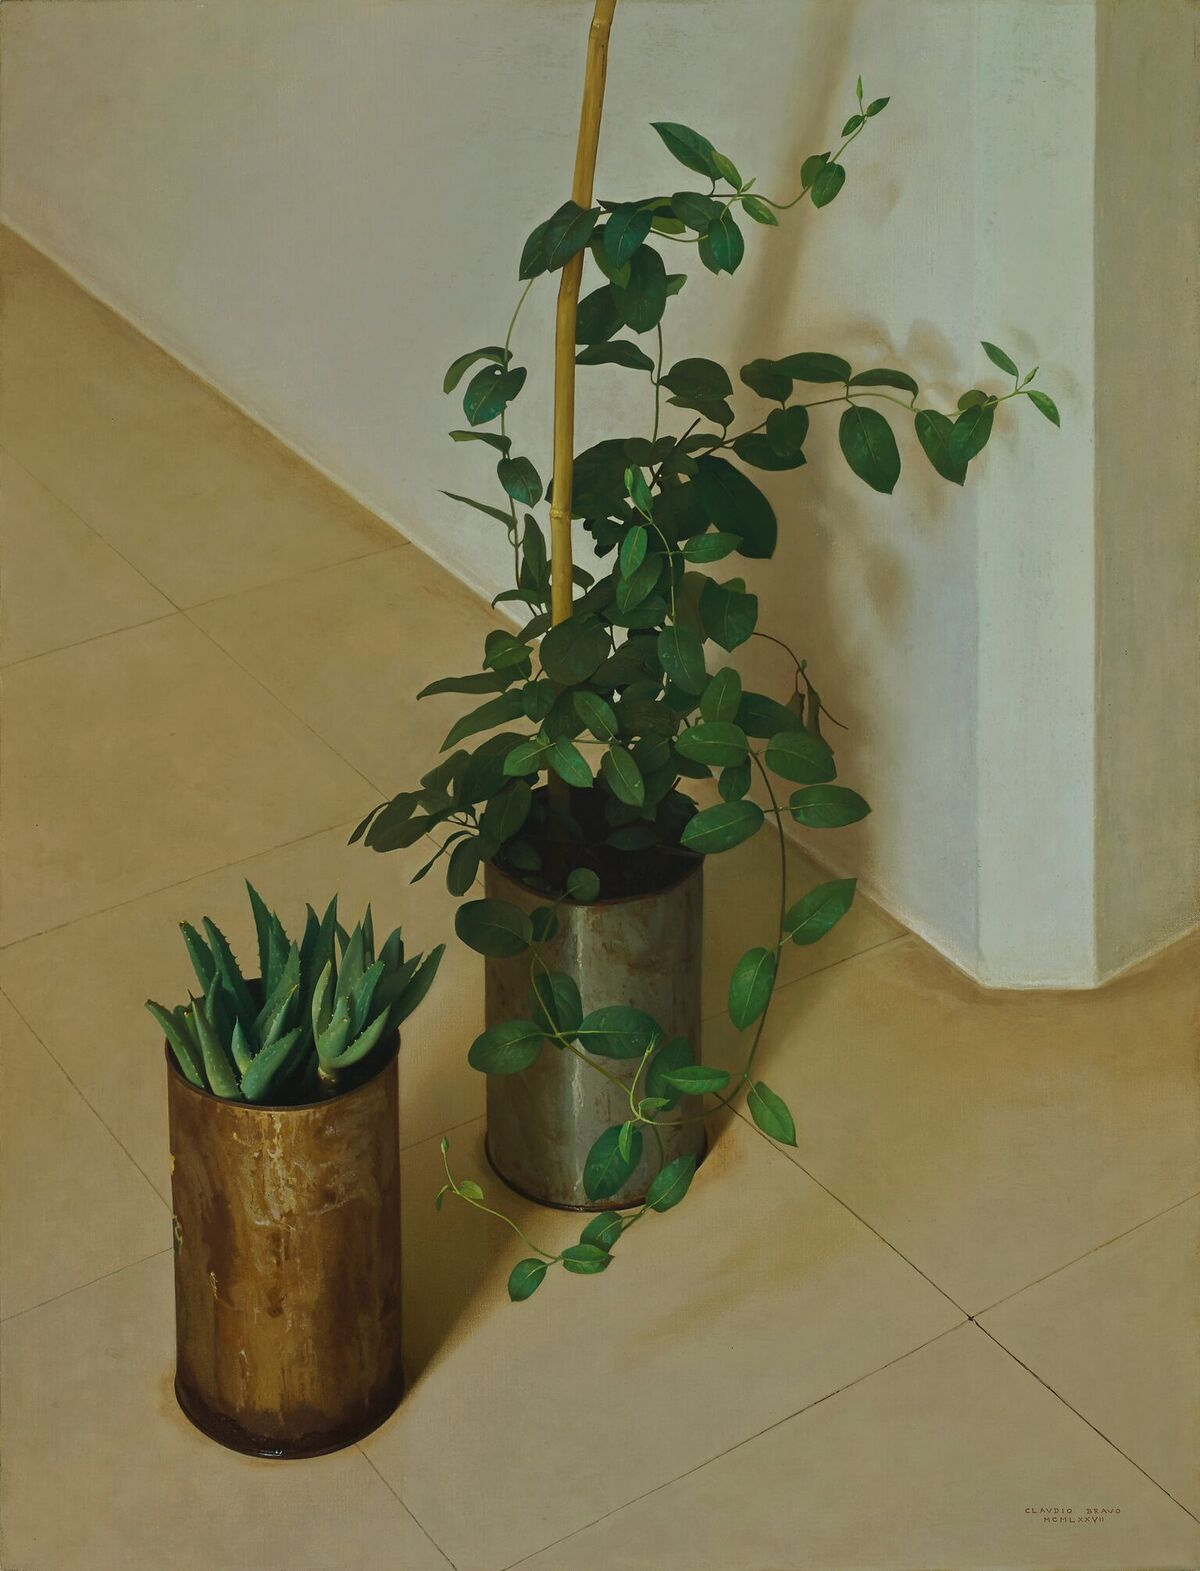 Claudio Bravo (1936-2011)   Dos Plantas , 1977  oil on canvas 35 x 27 inches; 88.9 x 68.6 centimeters